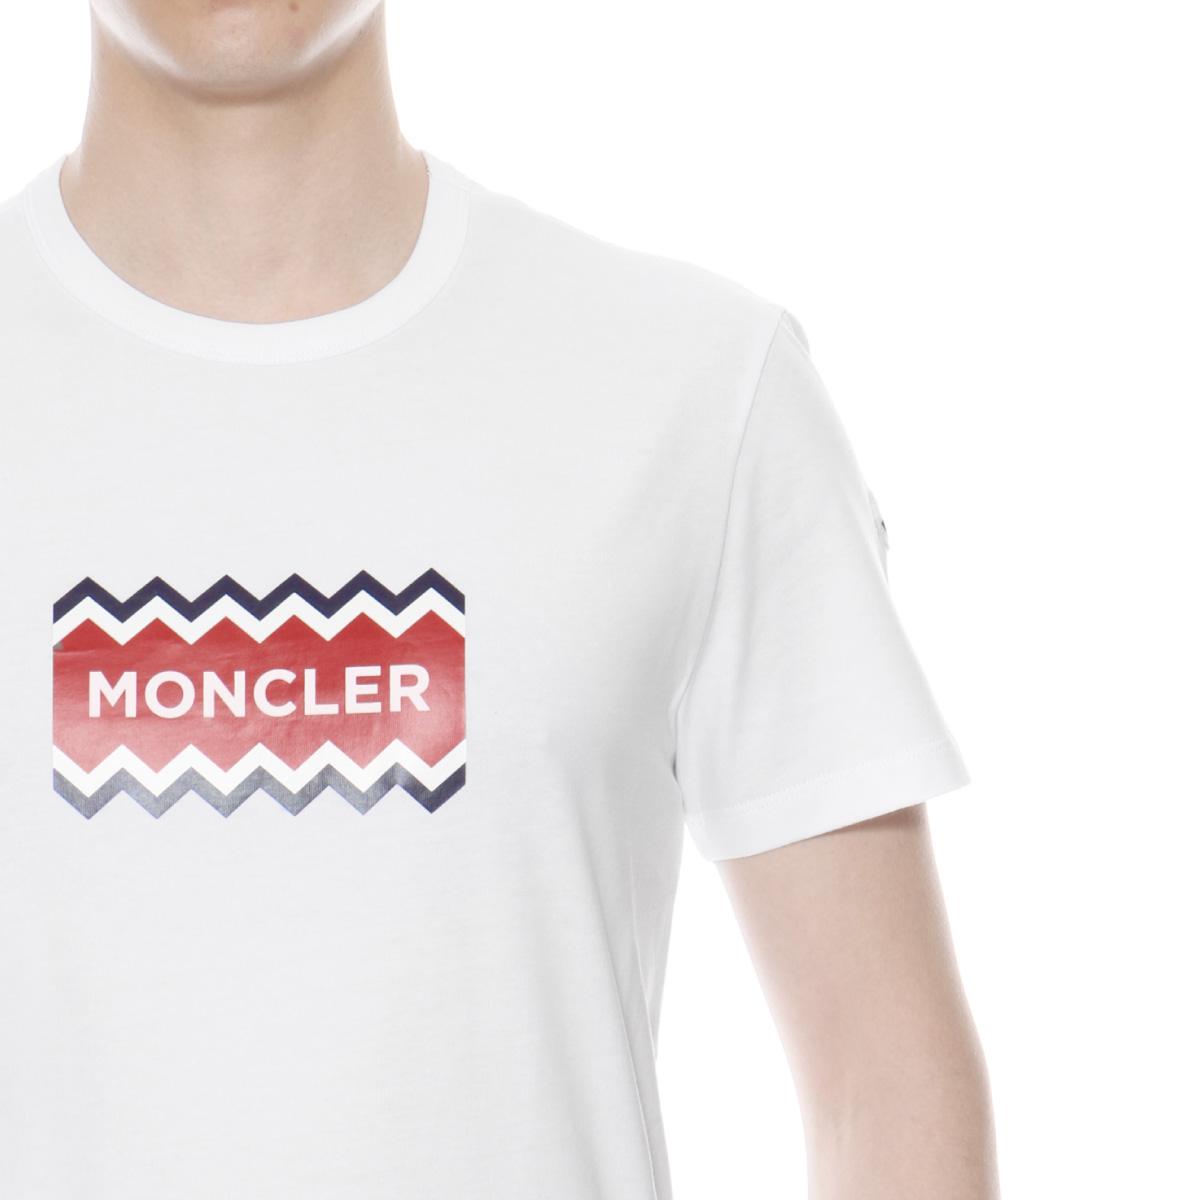 5cedb4c6f 8037250 Monk rail MONCLER T-shirt men 8390T 001 short sleeves T-shirt WHITE  white